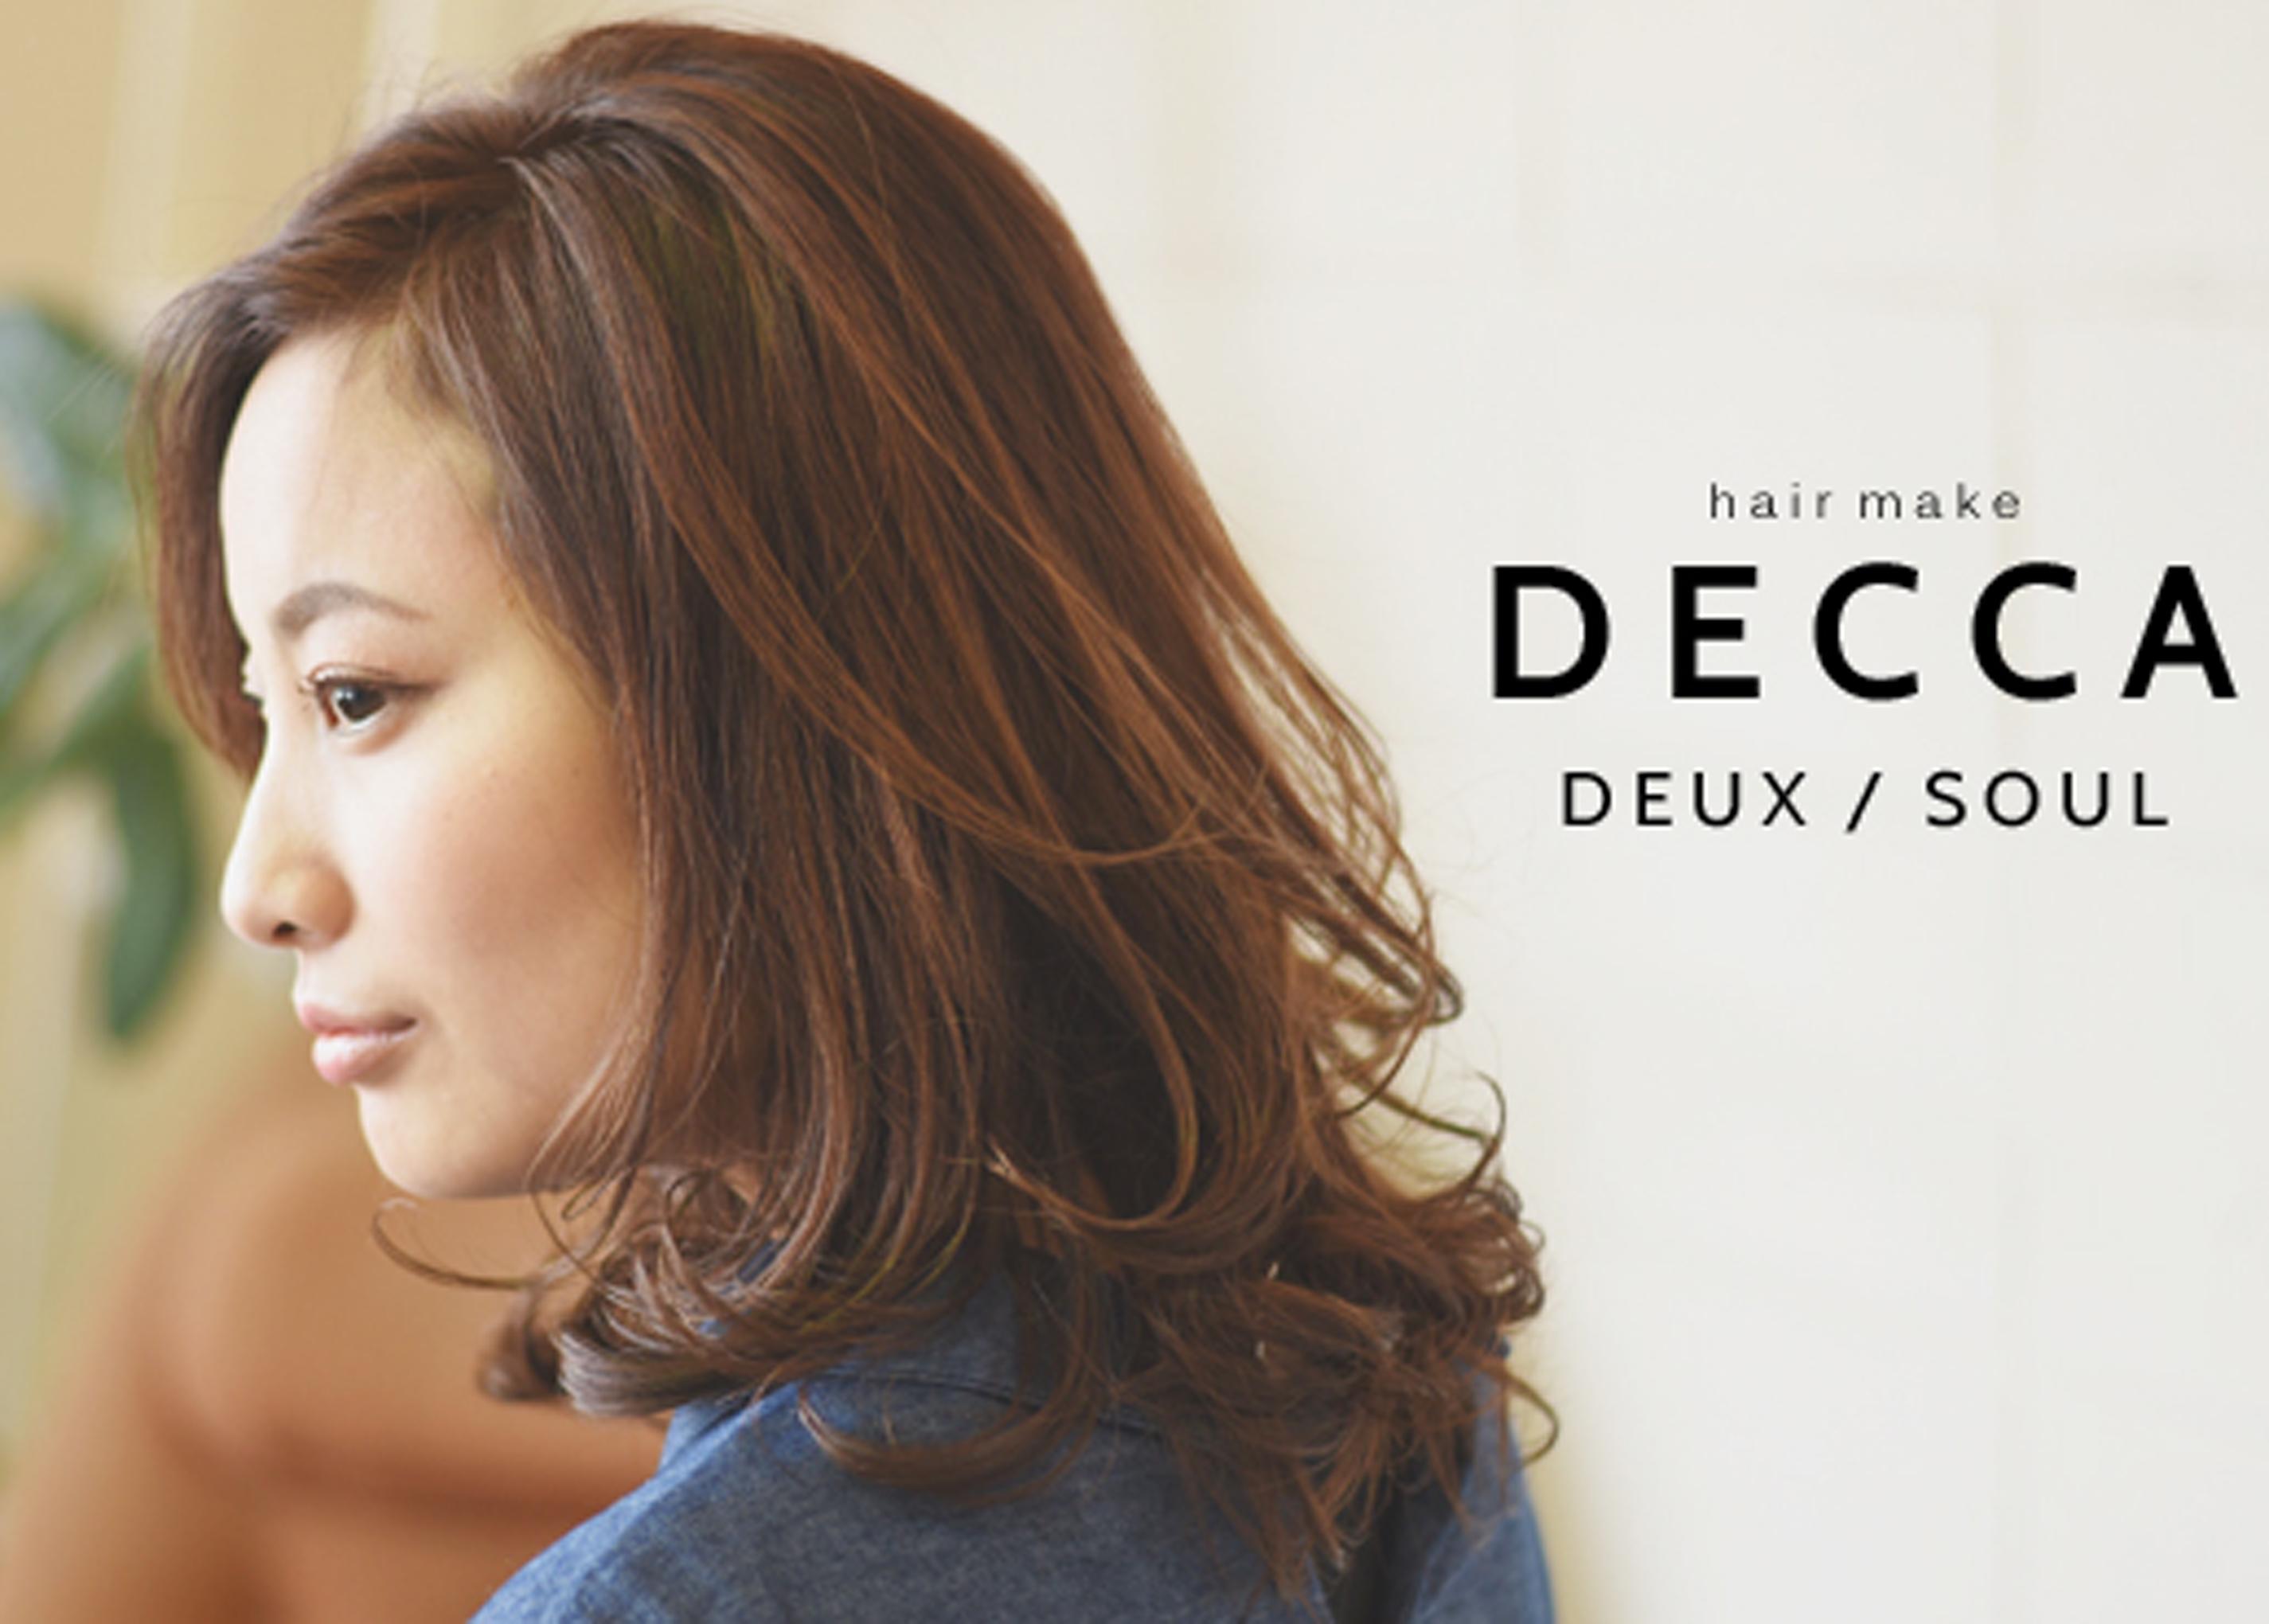 DECCA-DEUXデッカドゥ/新卒・アシスタント募集中